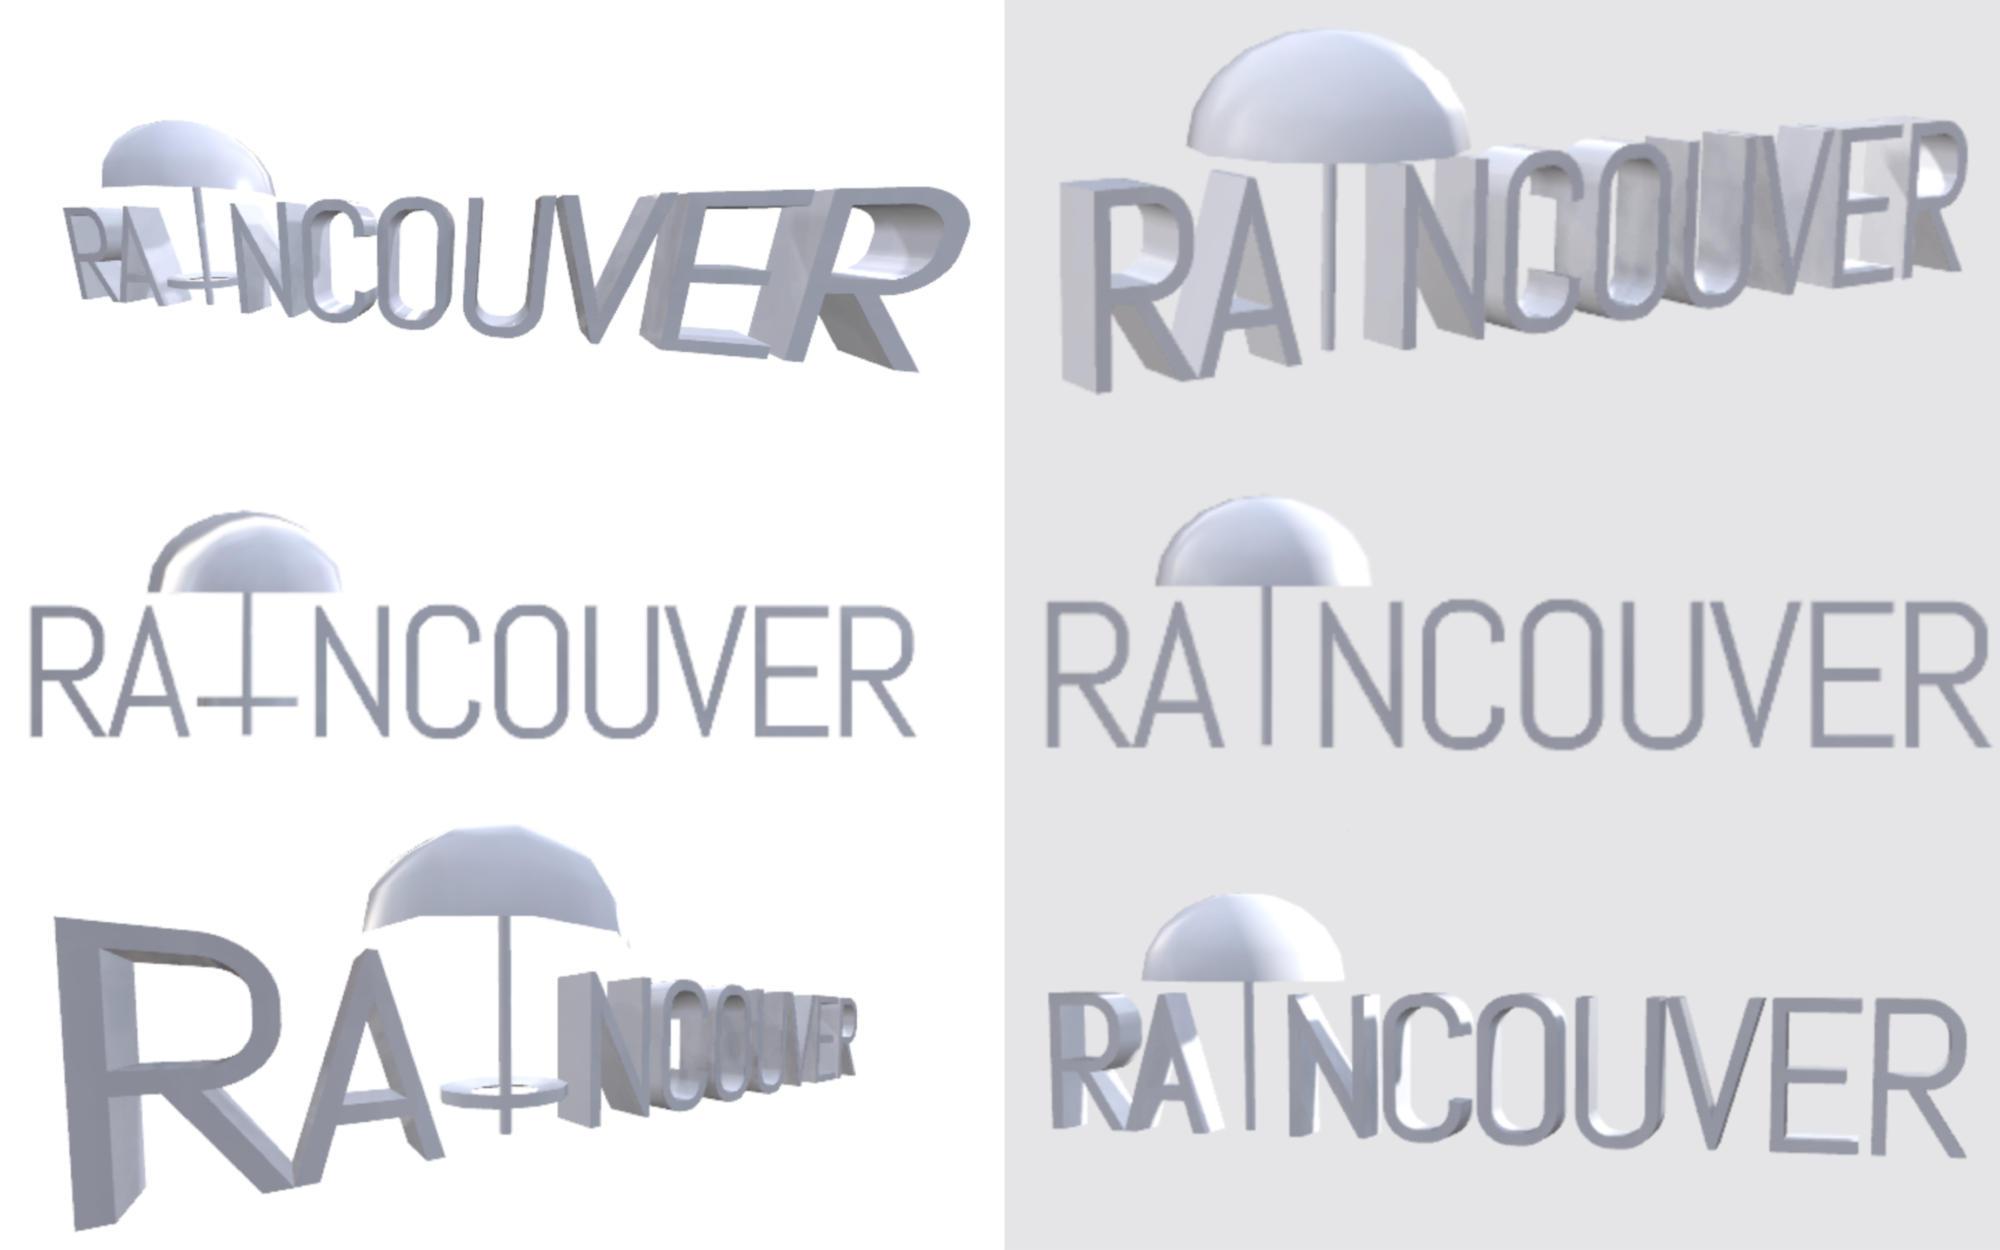 B11 - RAINCOUVER 1 - 11.jpg